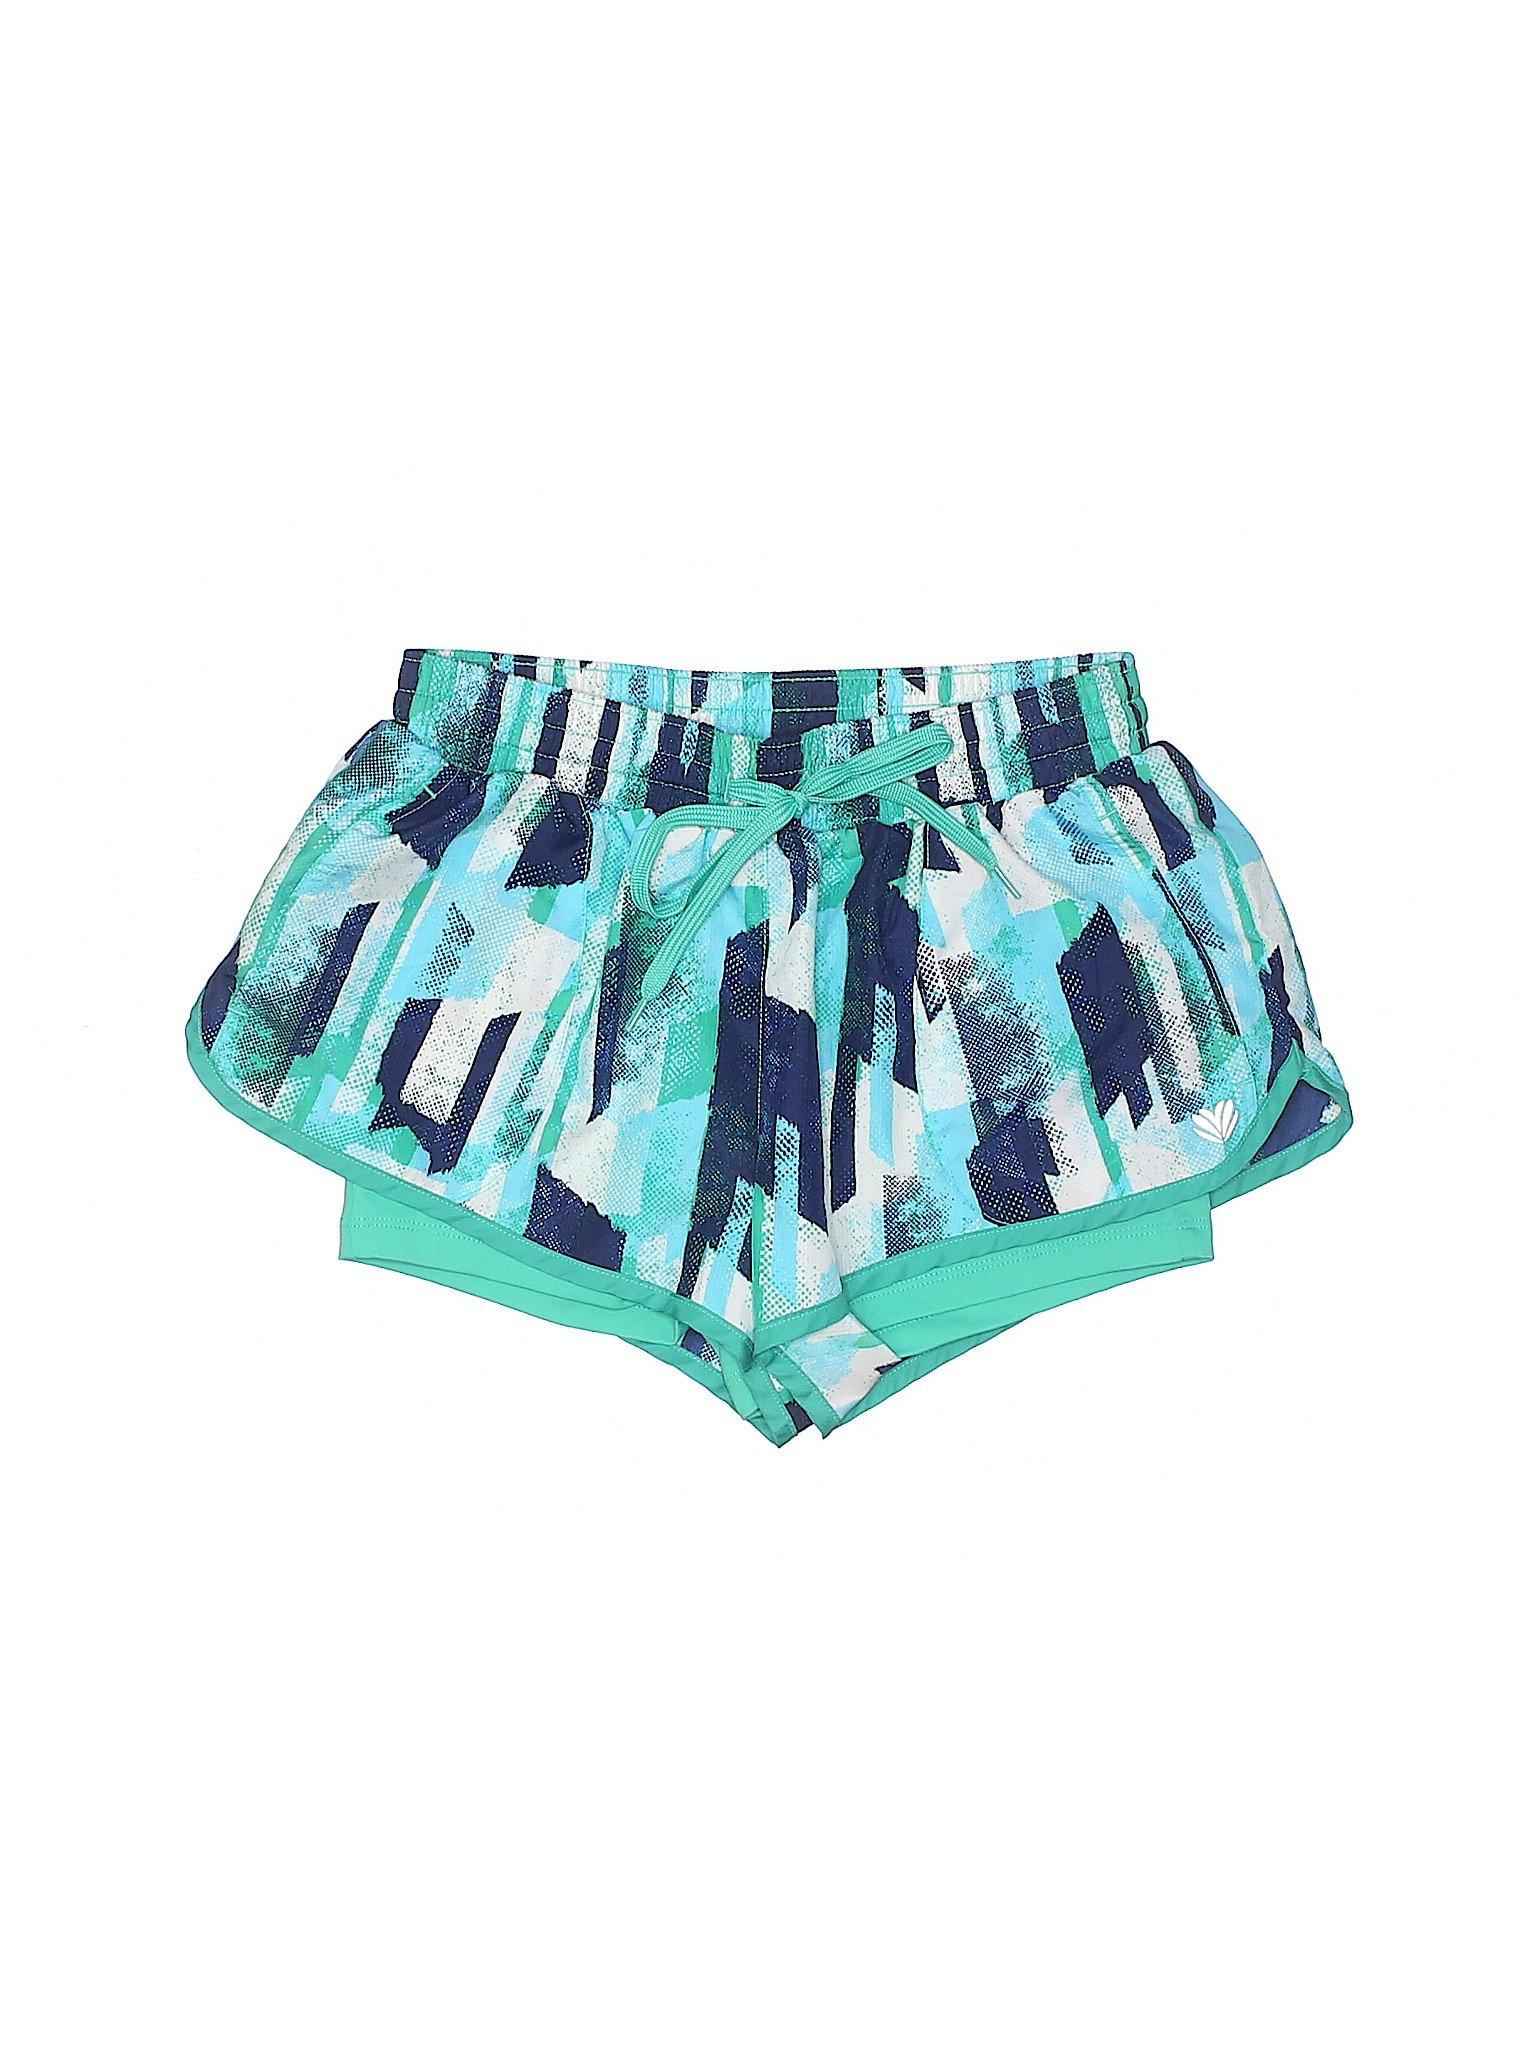 Shorts Leisure Athletic Forever winter 21 x7q6aqwOv0